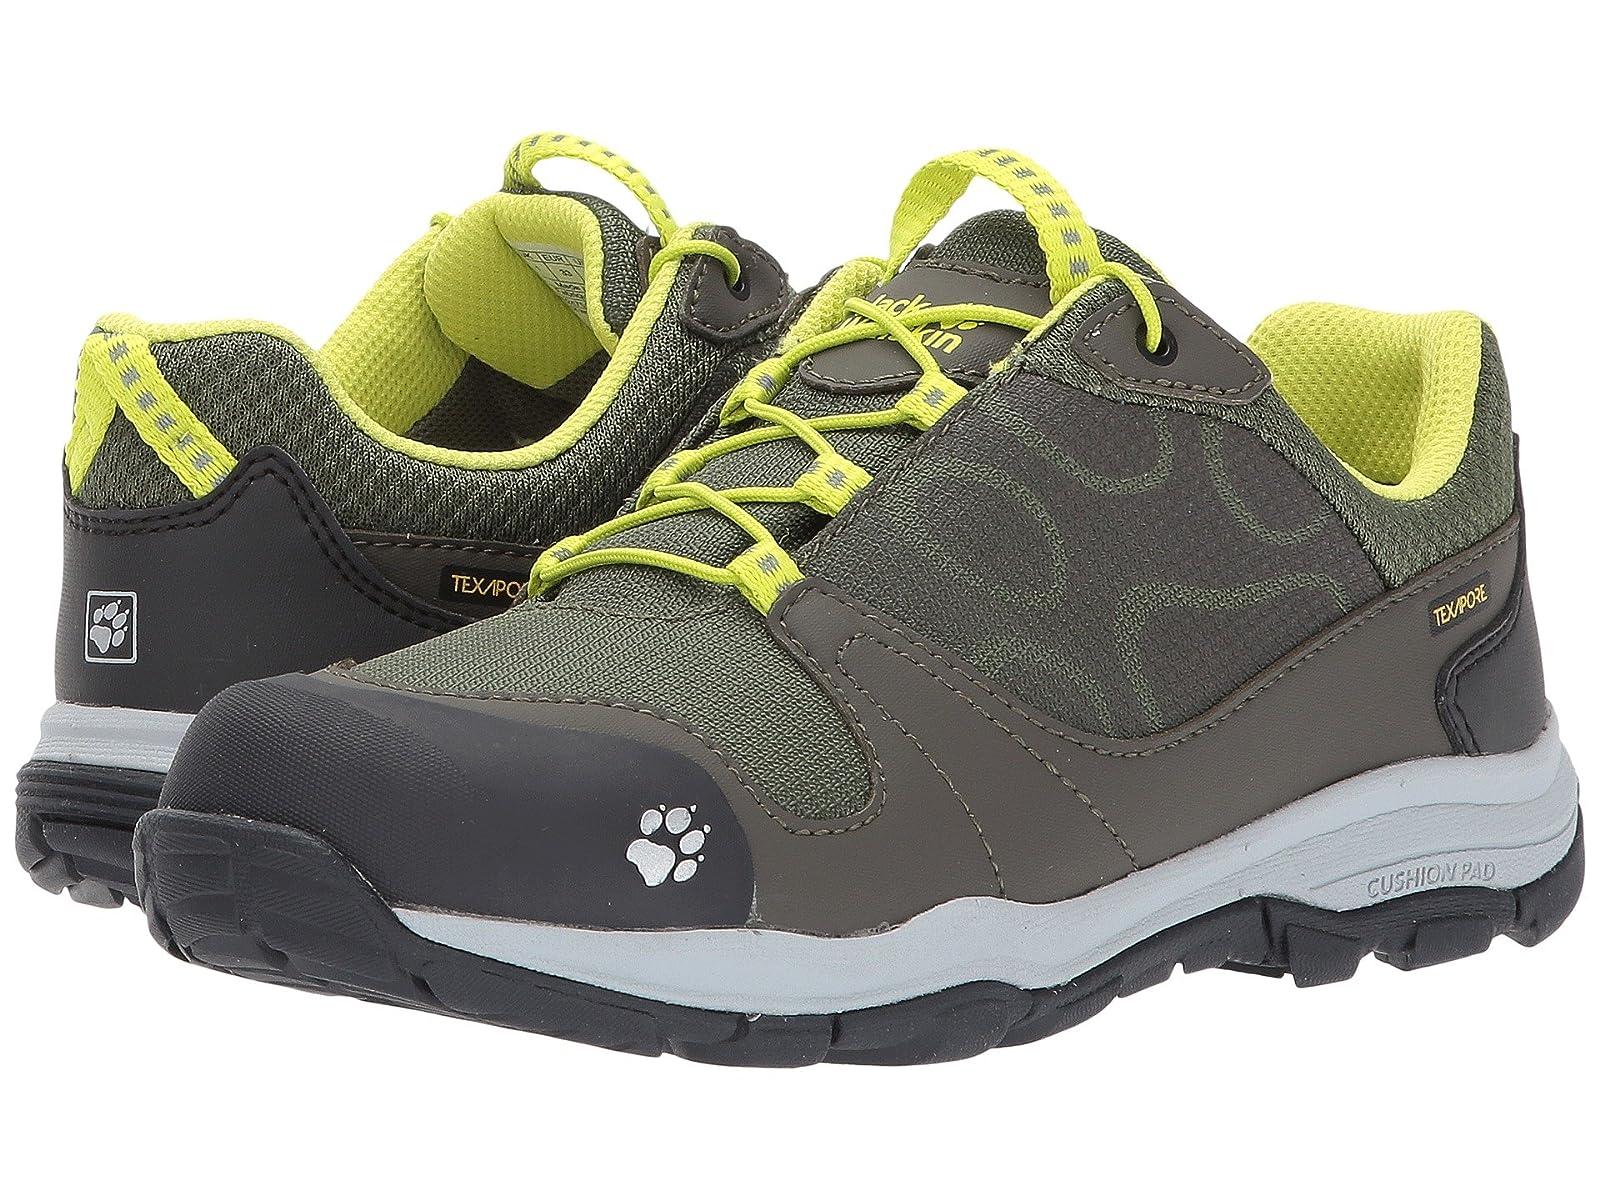 Jack Wolfskin Kids Akka Waterproof Low (Toddler/Little Kid/Big Kid)Atmospheric grades have affordable shoes